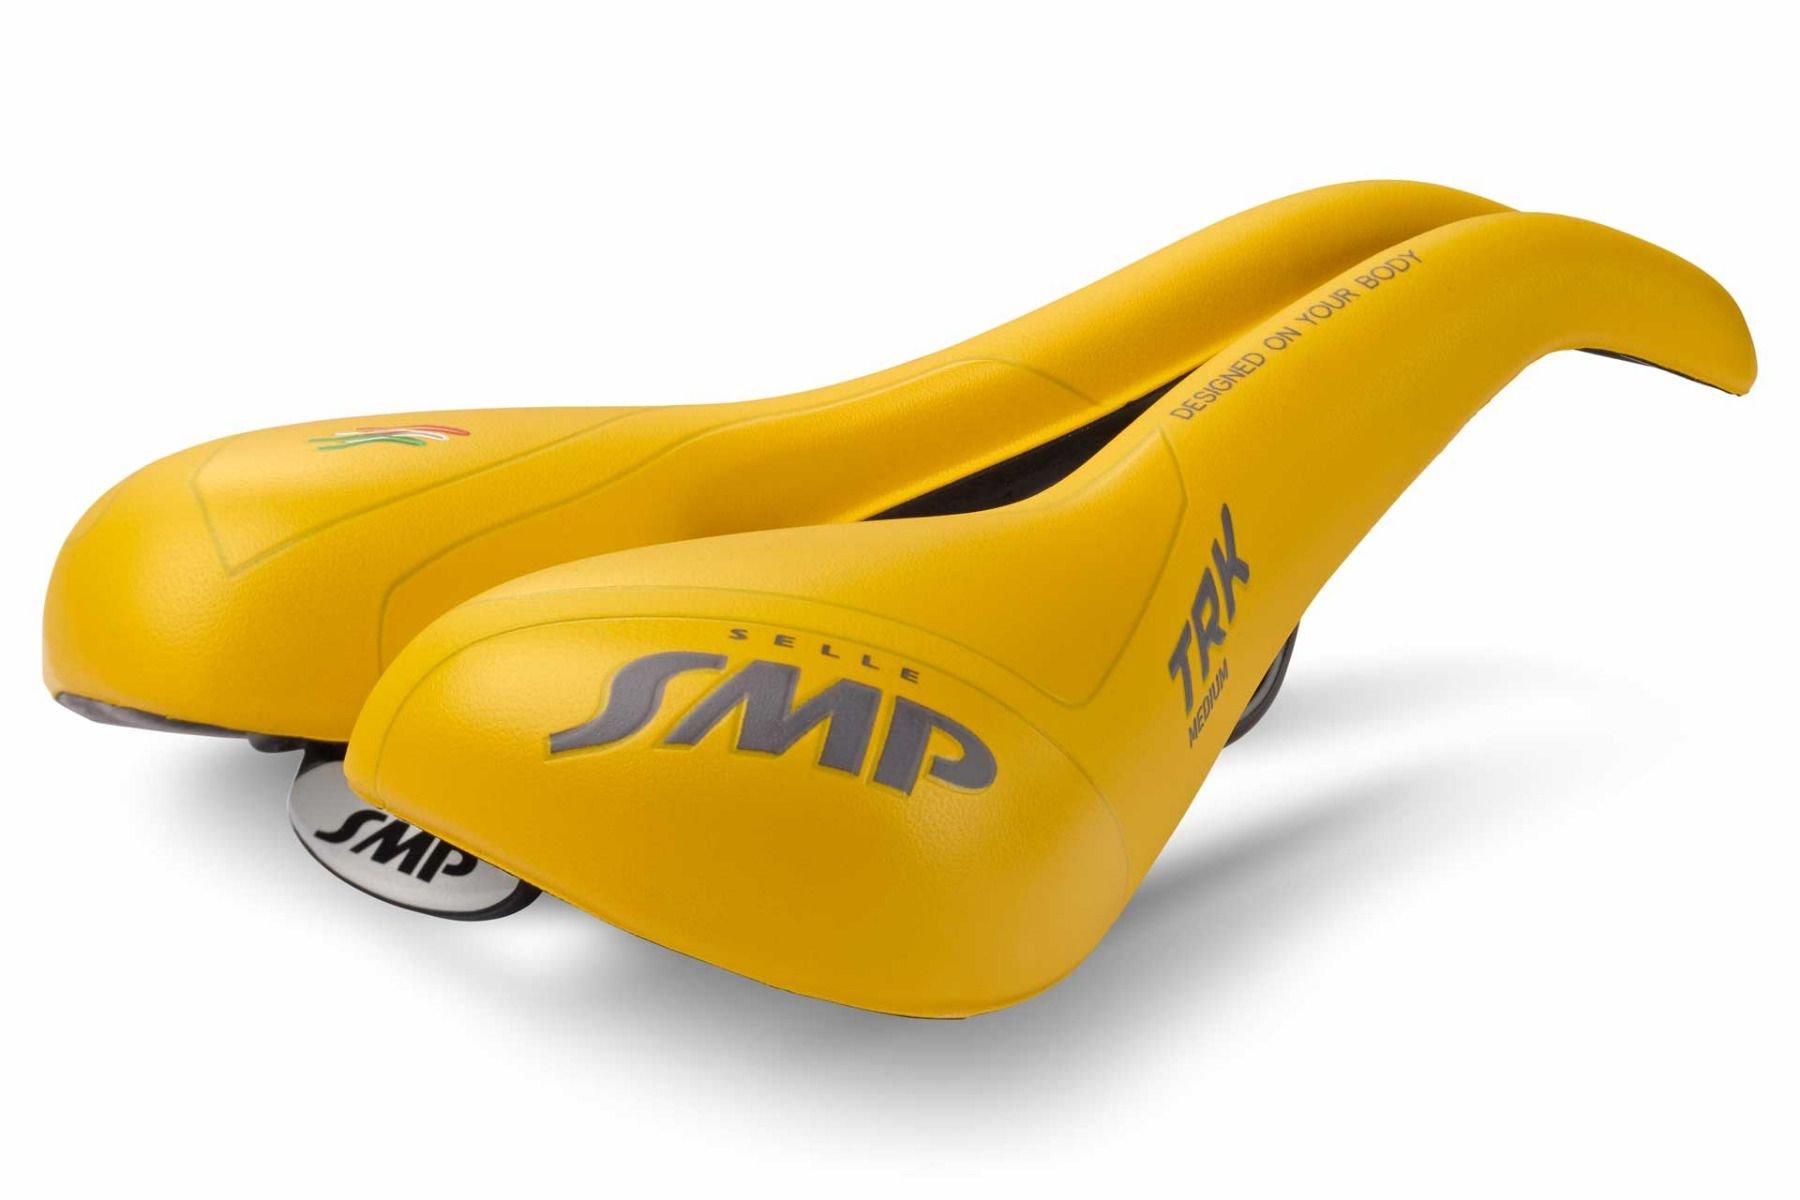 Sedlo SMP  TRK MEDIUM  Yellow